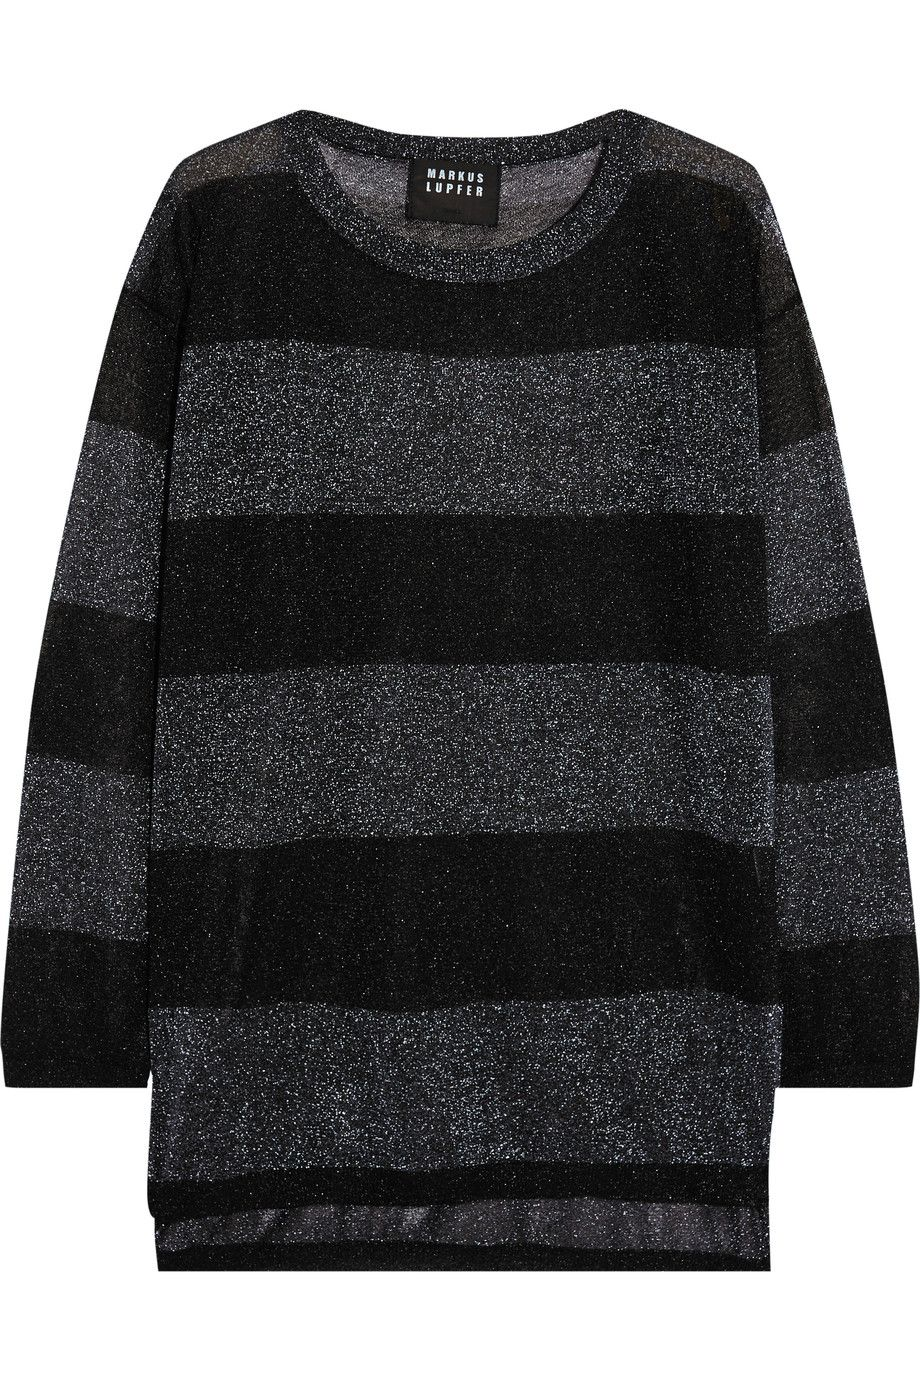 MARKUS LUPFER Harriet striped metallic knitted sweater. #markuslupfer #cloth #sweater